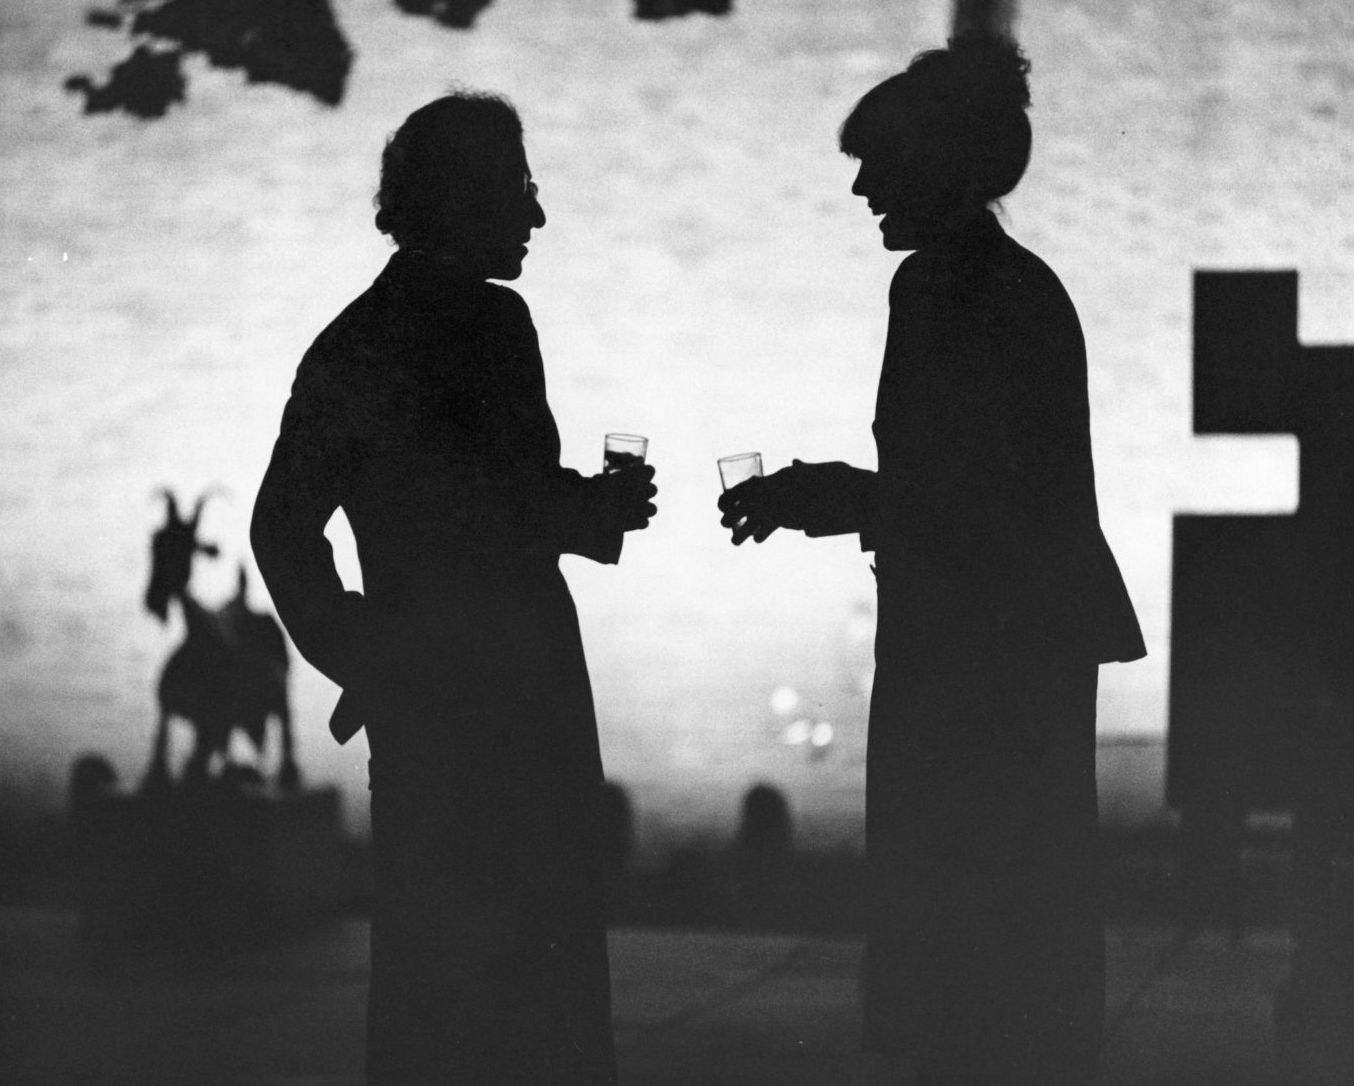 Woody Allen and Diane Keaton in Manhattan